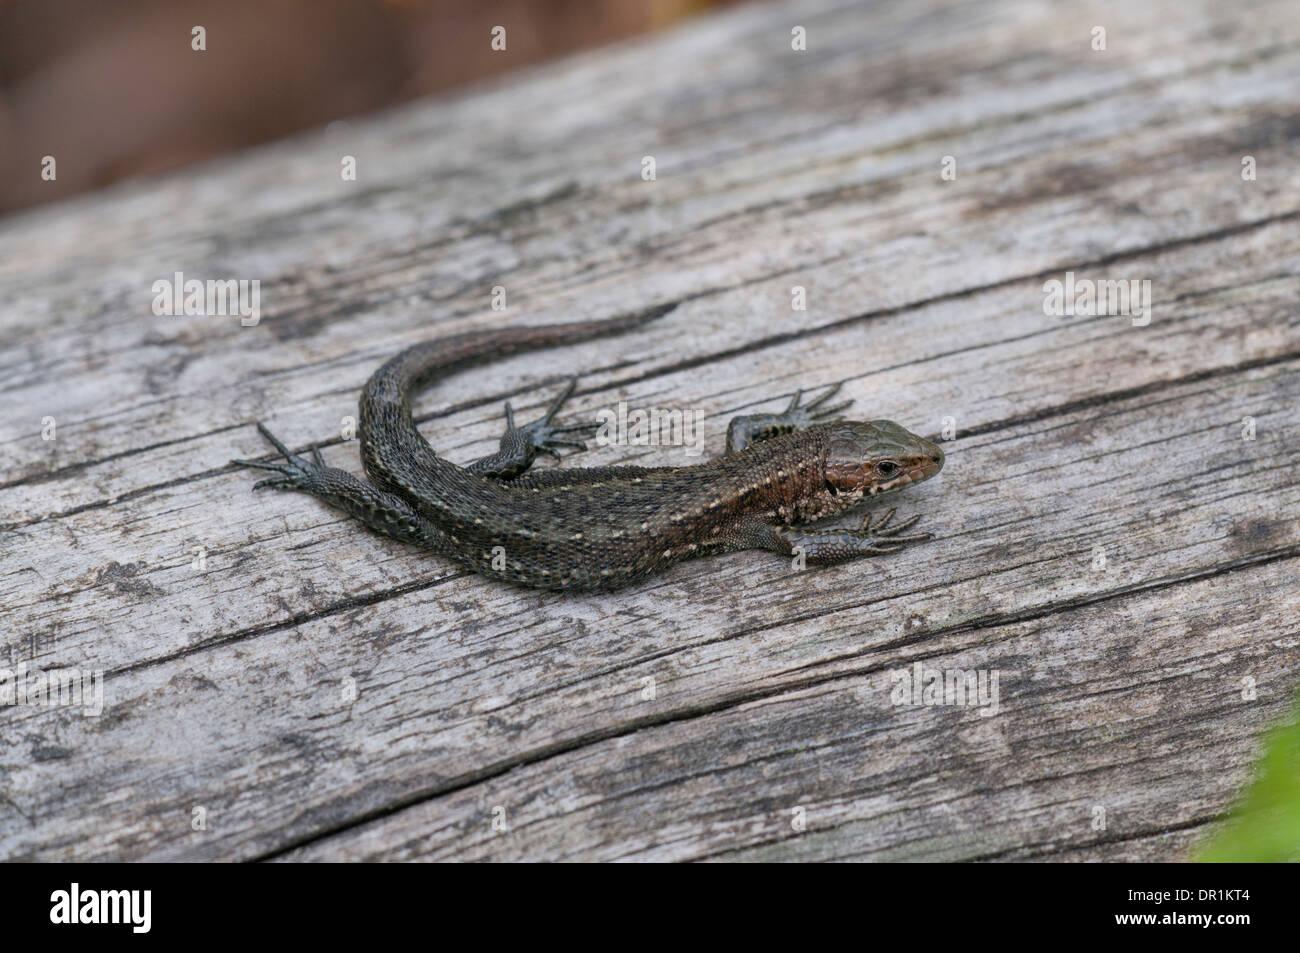 Common or viviparous lizard (Zootoca vivipara) Stock Photo